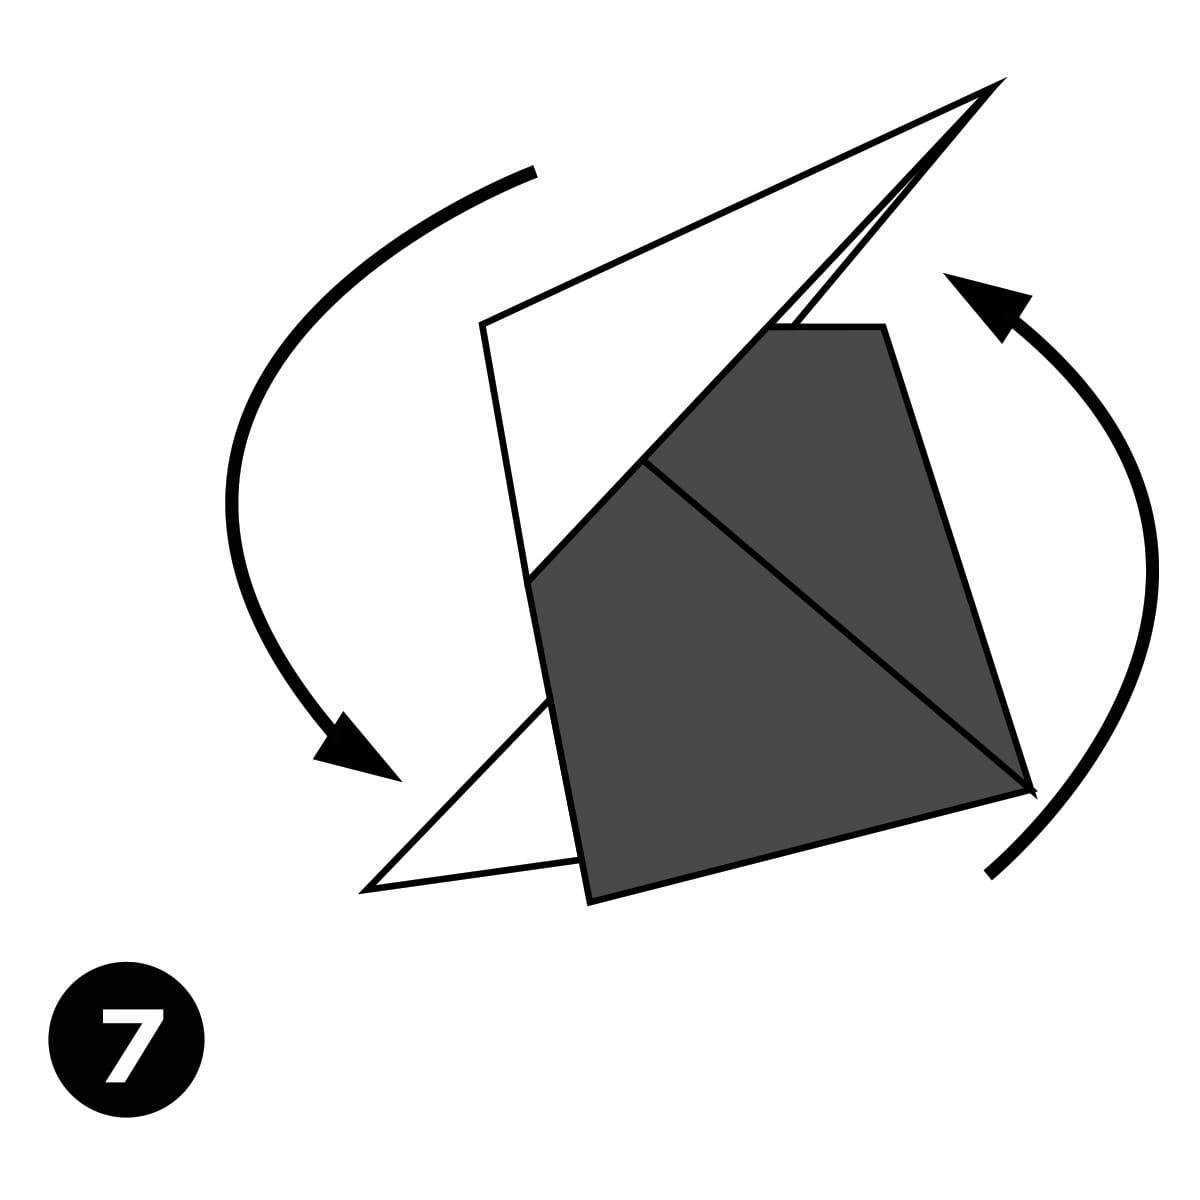 Ostrich Step 7